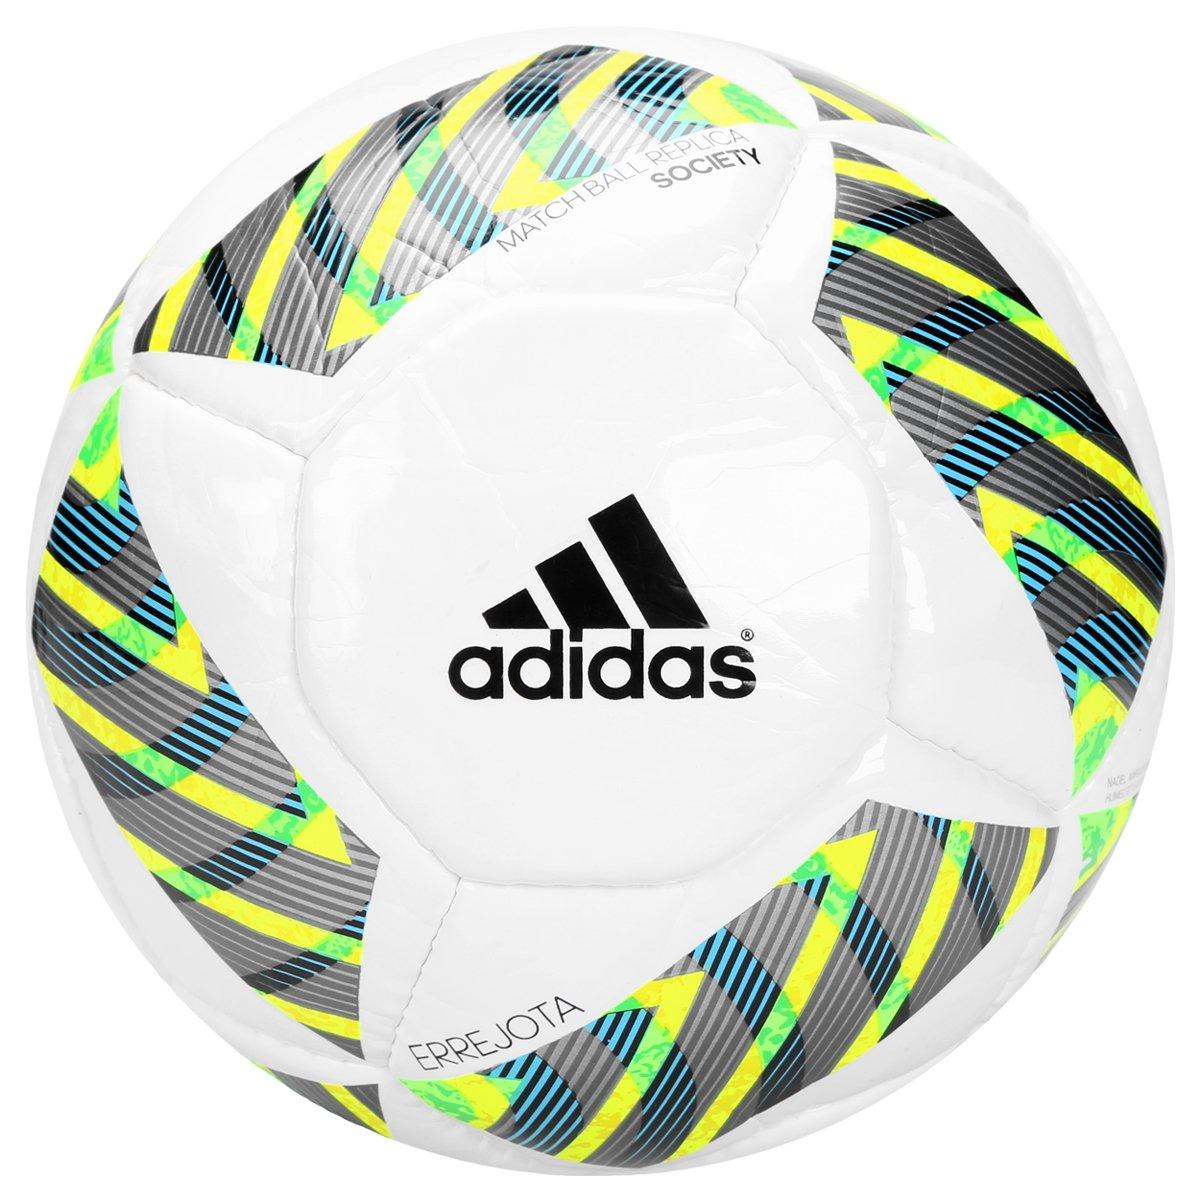 b9c673f88 ... Bola Futebol Society Adidas Errejota Fifa - Compre Agora Ne ...